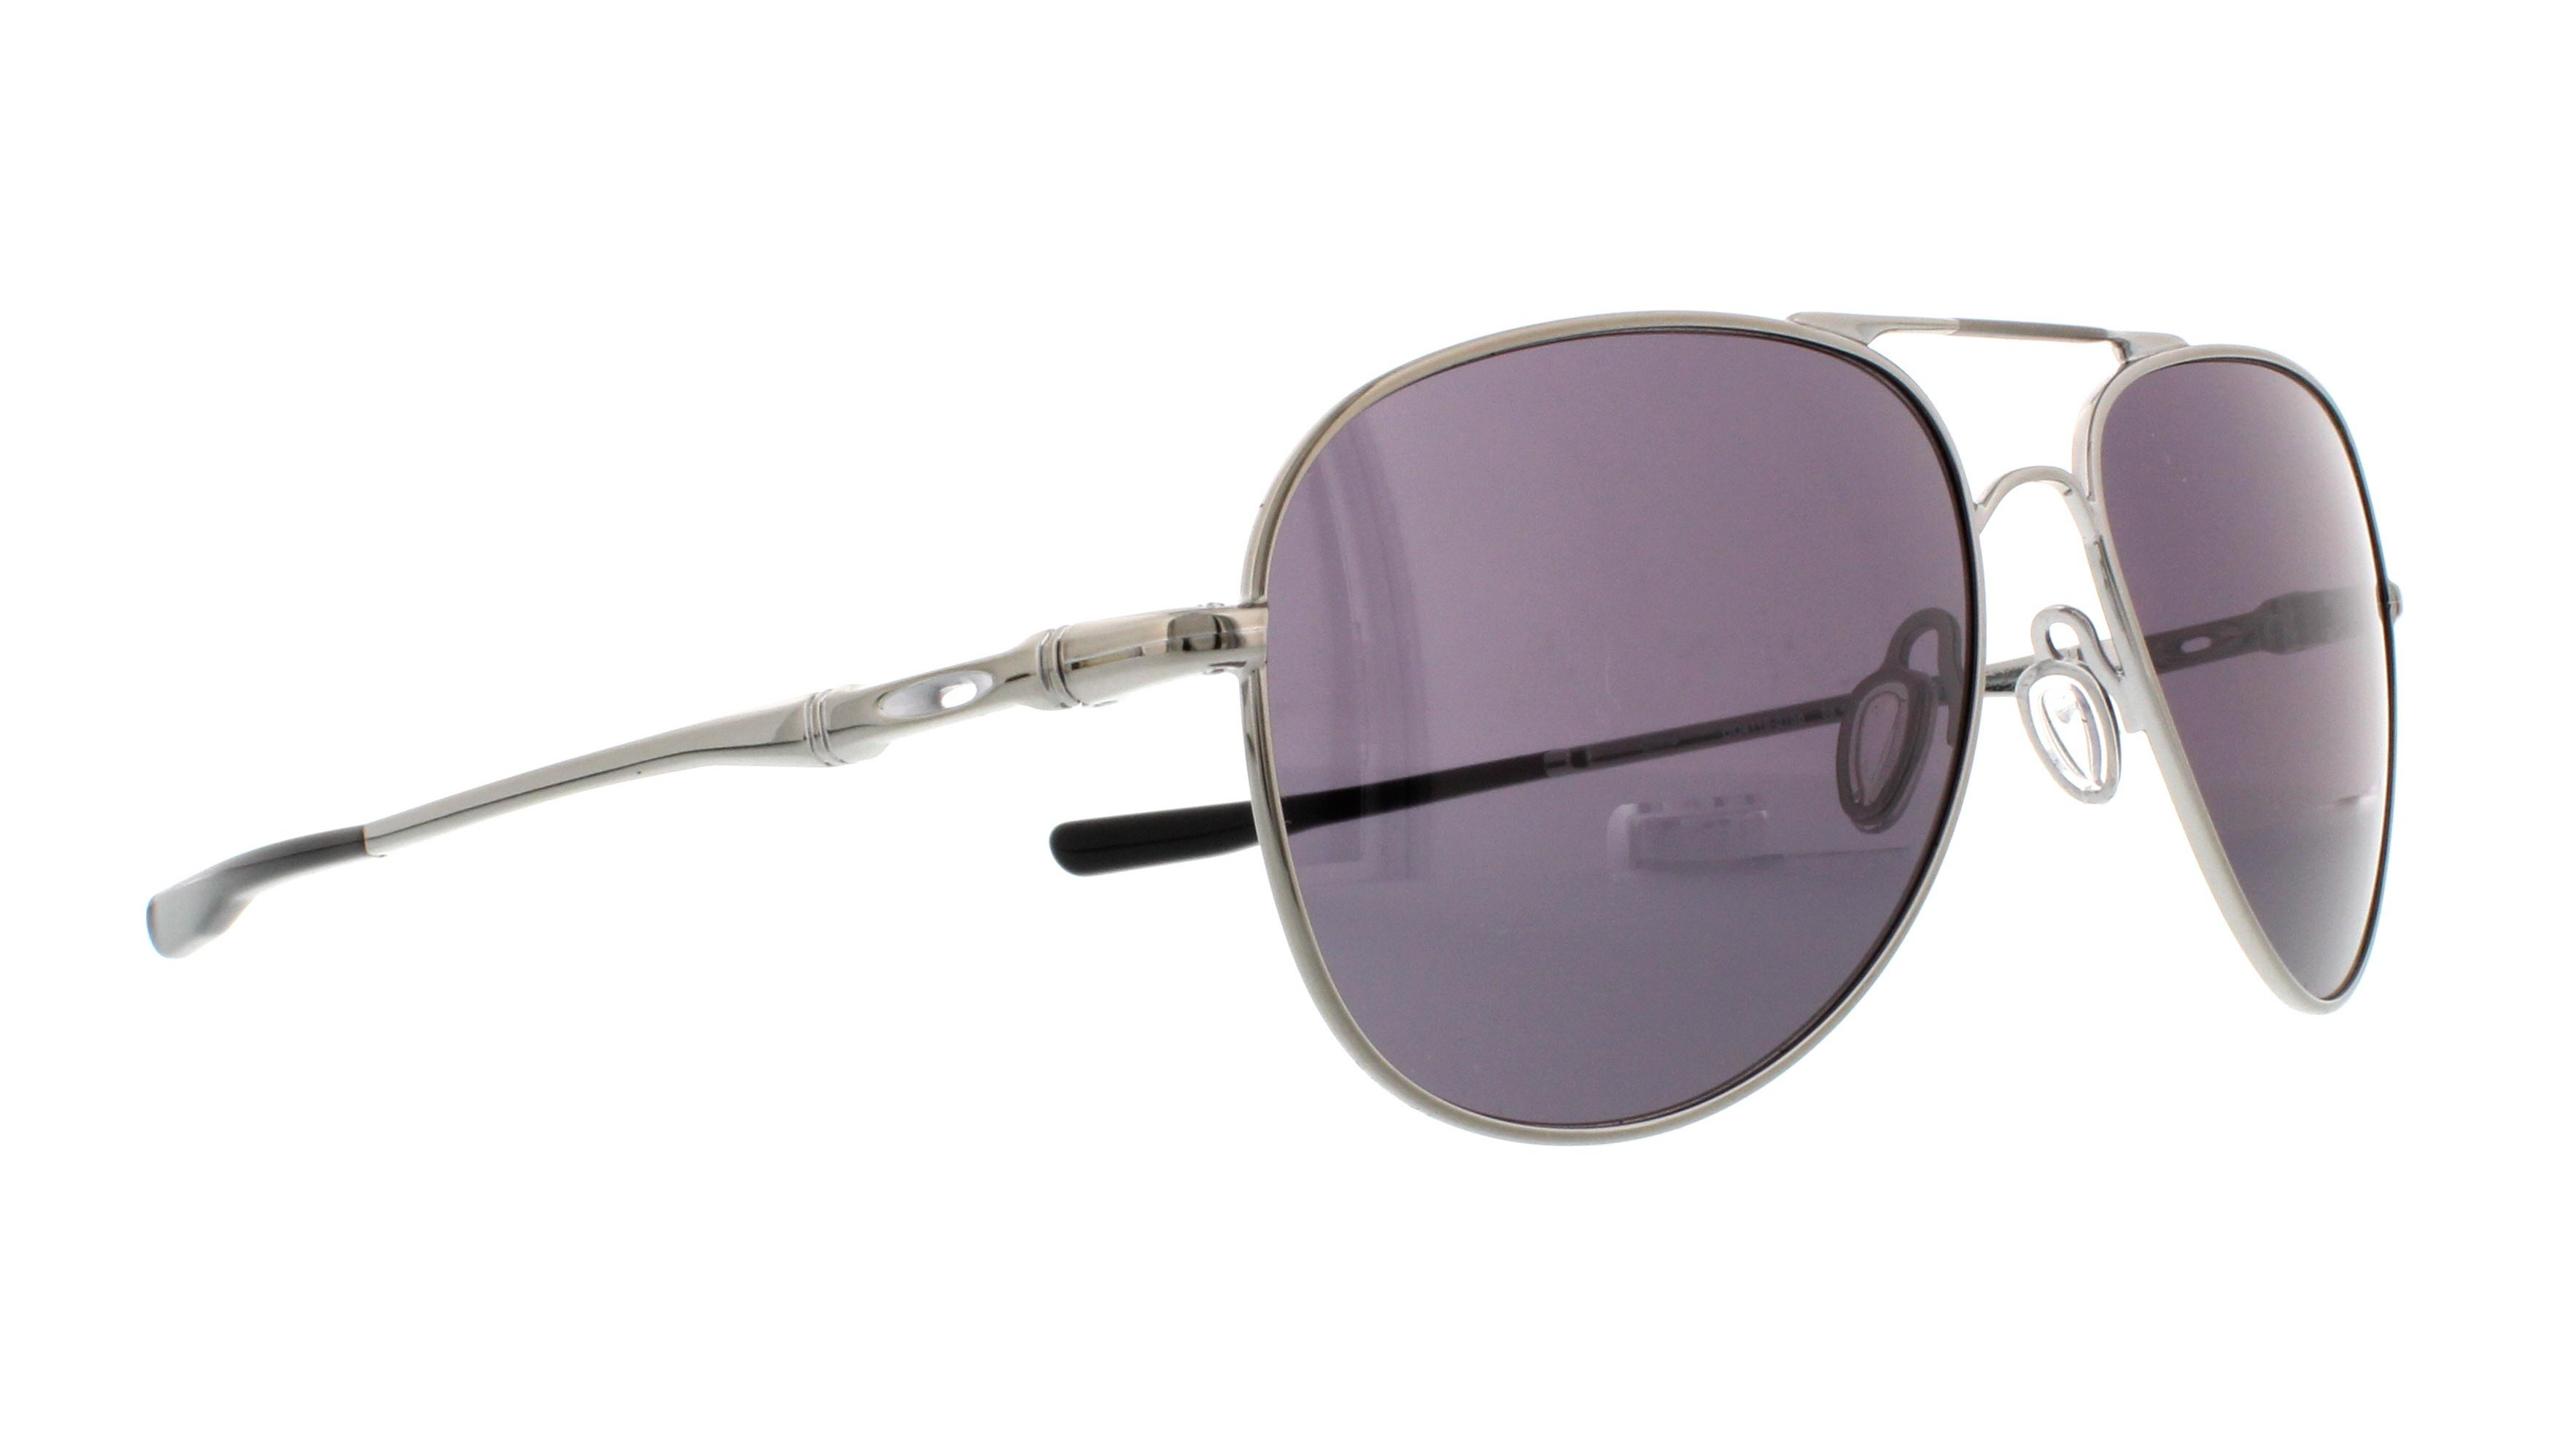 ec4f7fcca2f ... matte black w prizm daily polarized sunglasses oo4119 0558 577f4 61de4  best oakley sunglasses elmont oo4119 01 gunmetal 58mm 27319 34c7d ...